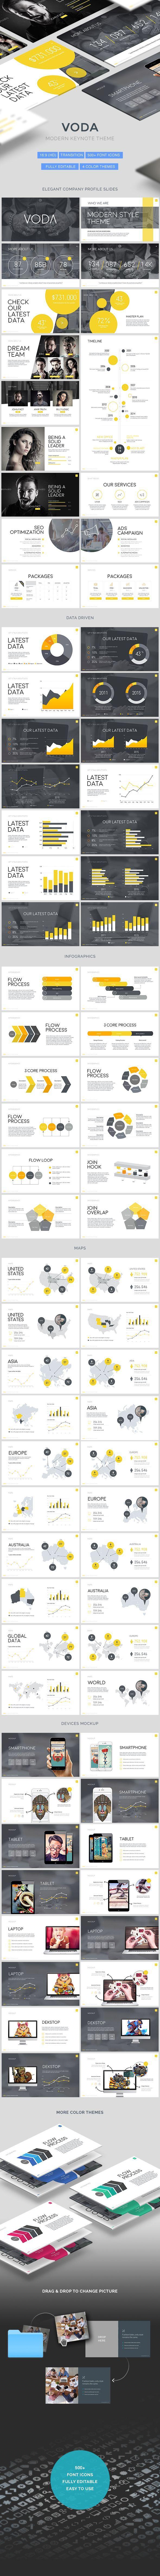 Voda - Creative Keynote Presentation Template | presentation ...